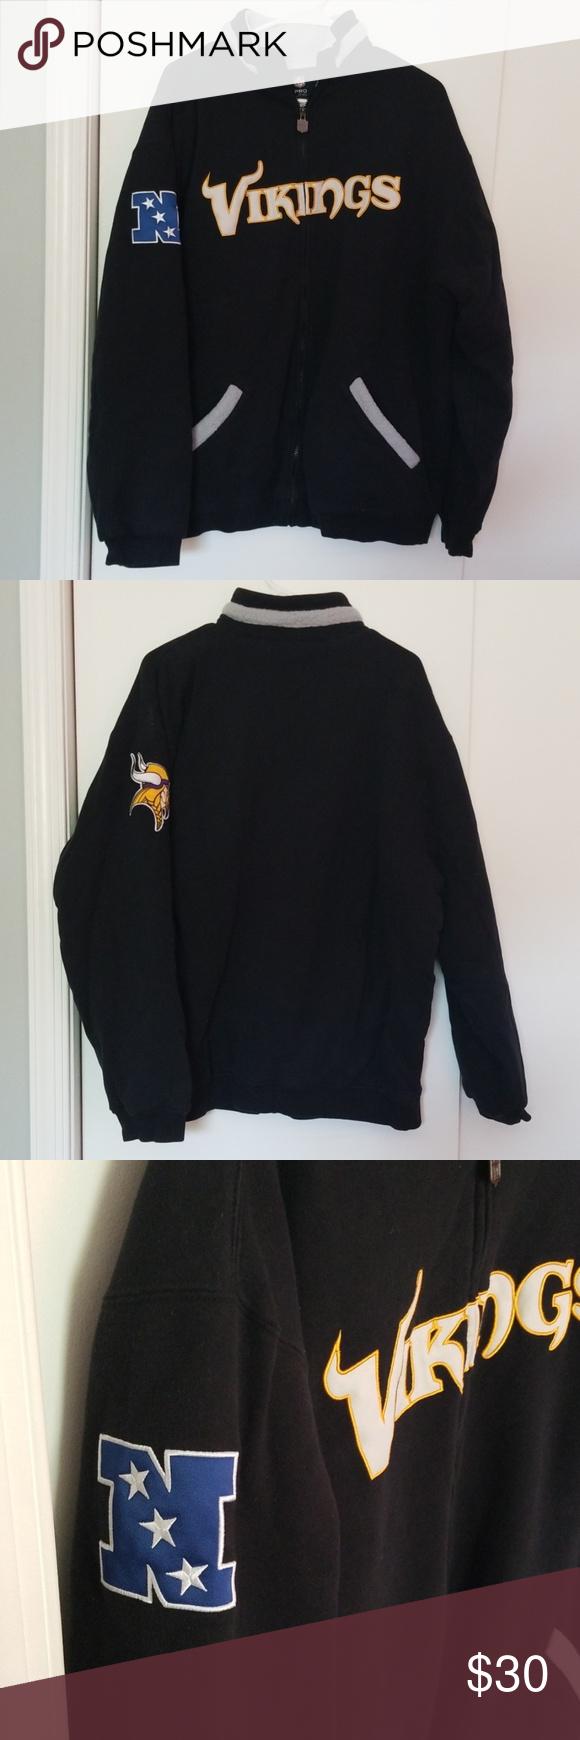 Minnesota Vikings Nfl Proline Jacket Xl Minnesota Vikings Nfl Proline Jacket Size Xl Vikings Across Full Zip Front Nfc L Jackets Clothes Design Fashion Design [ 1740 x 580 Pixel ]